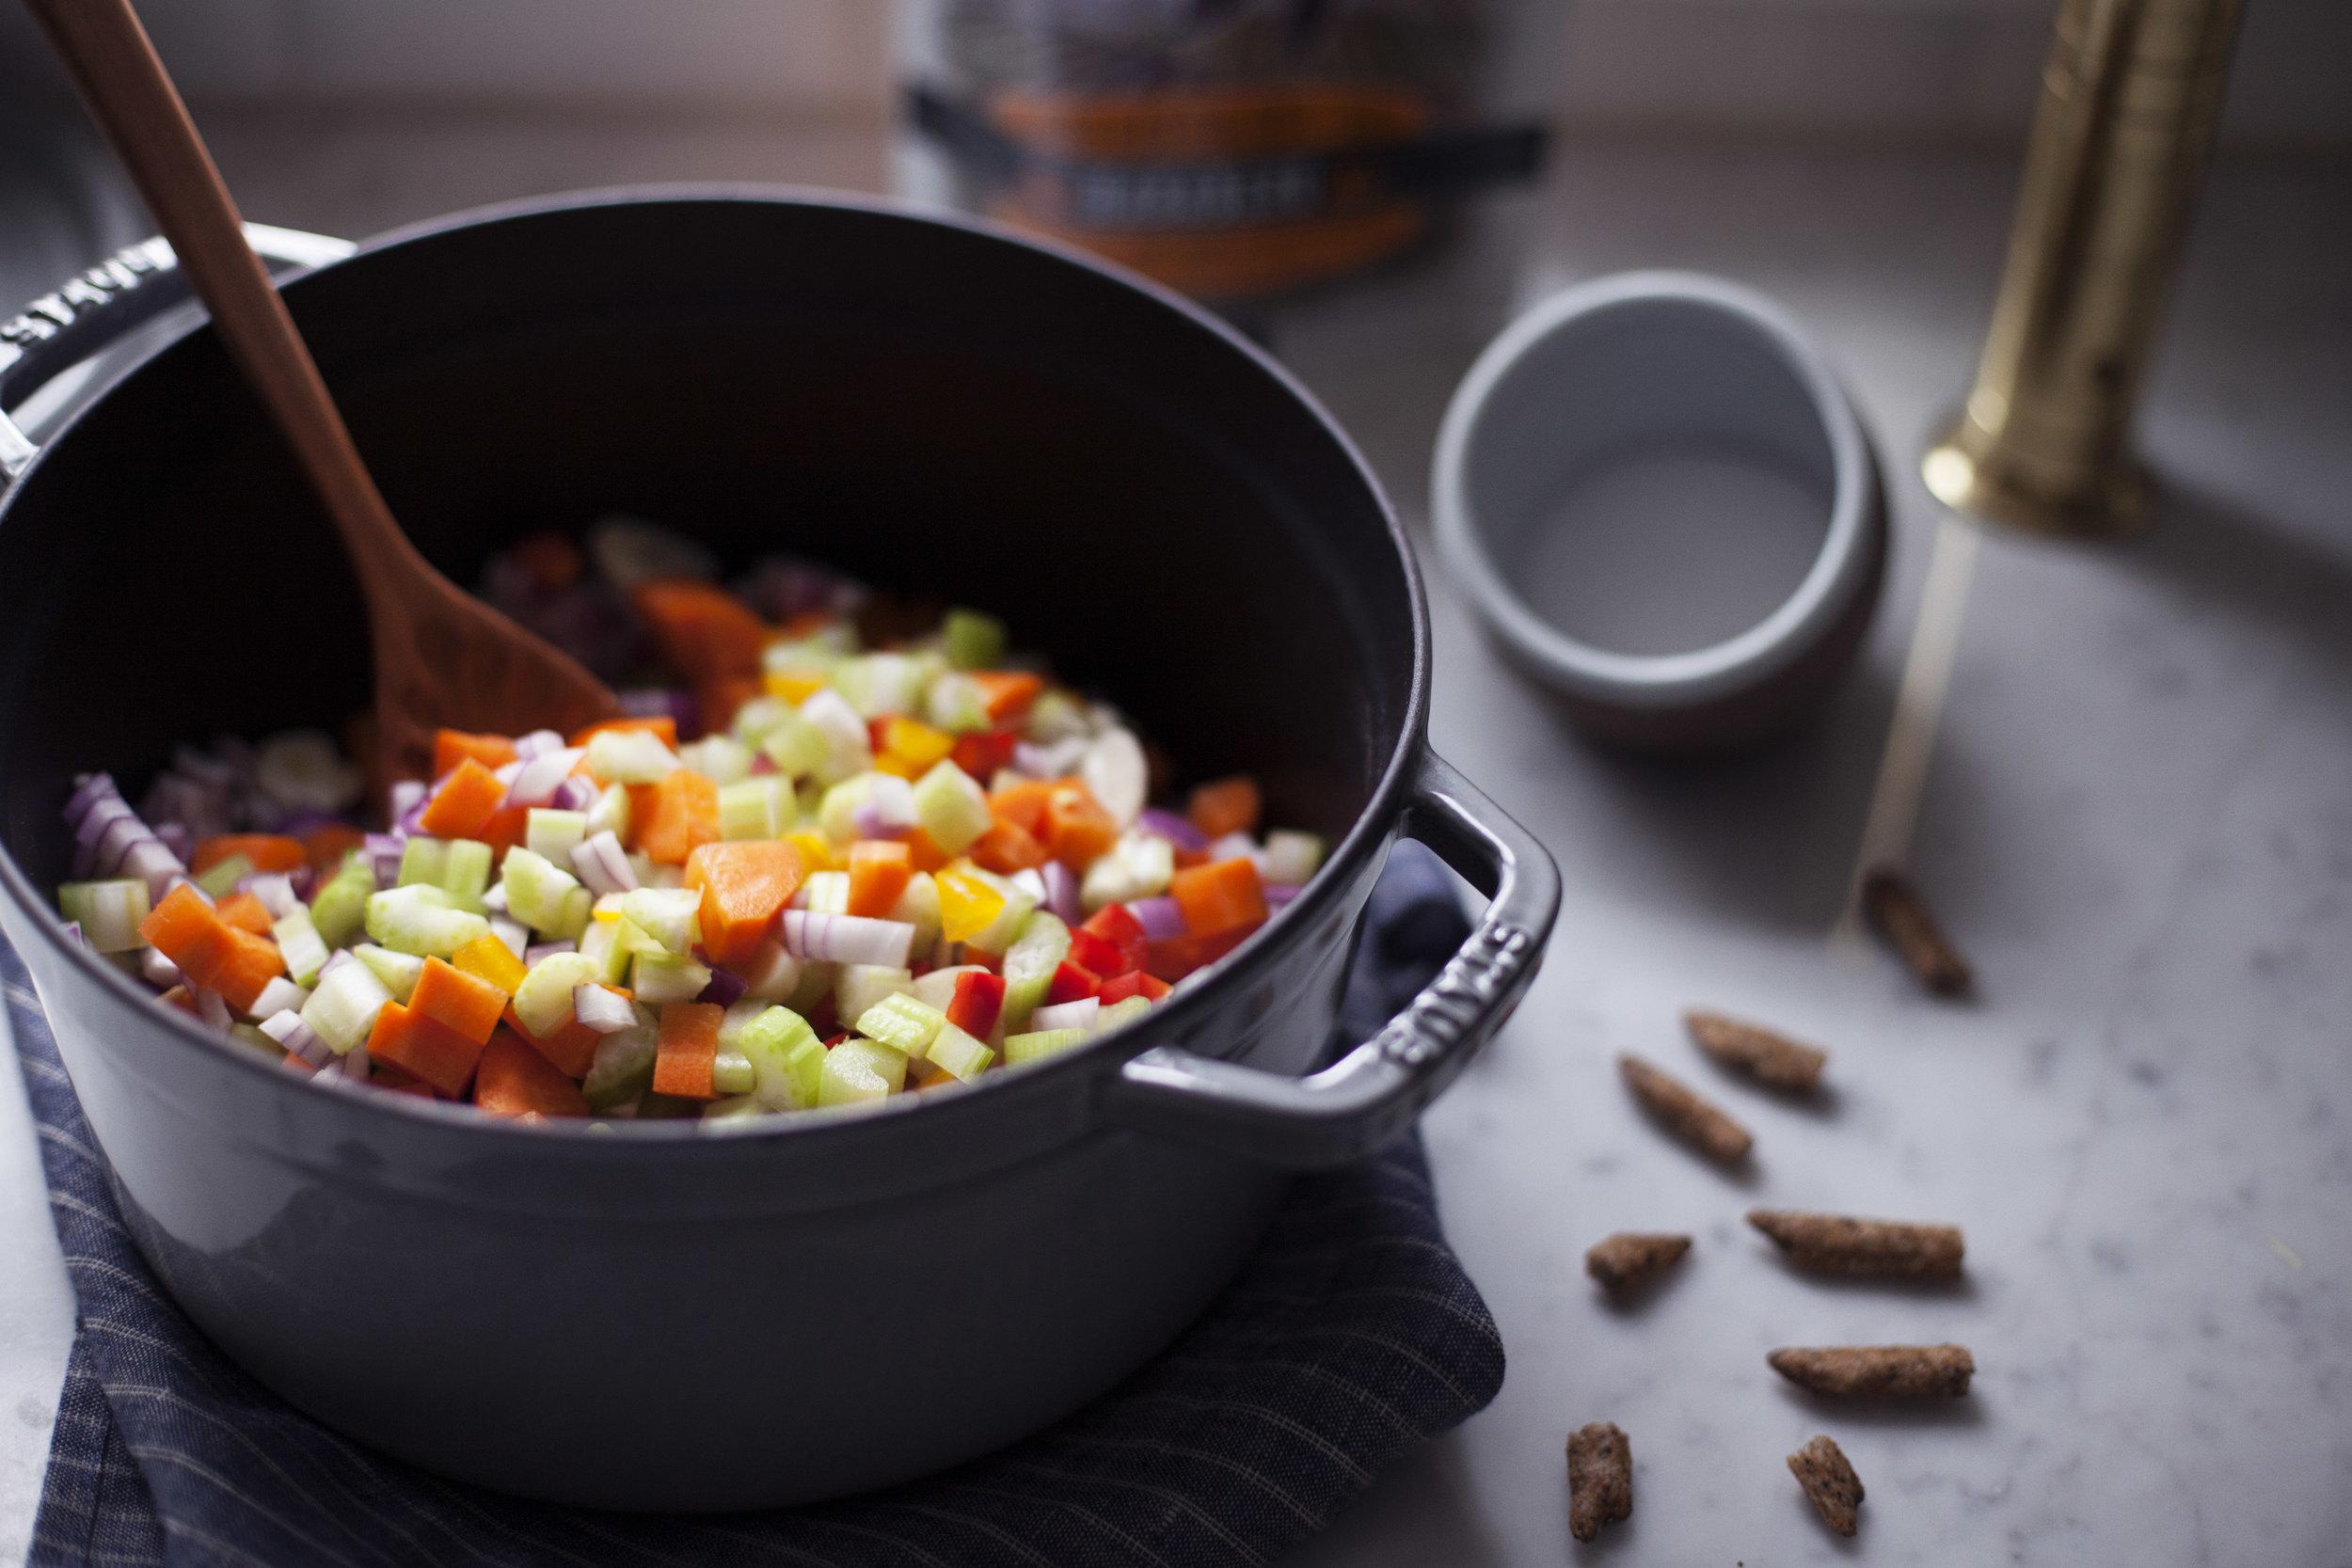 vegetarian chili iii.jpg